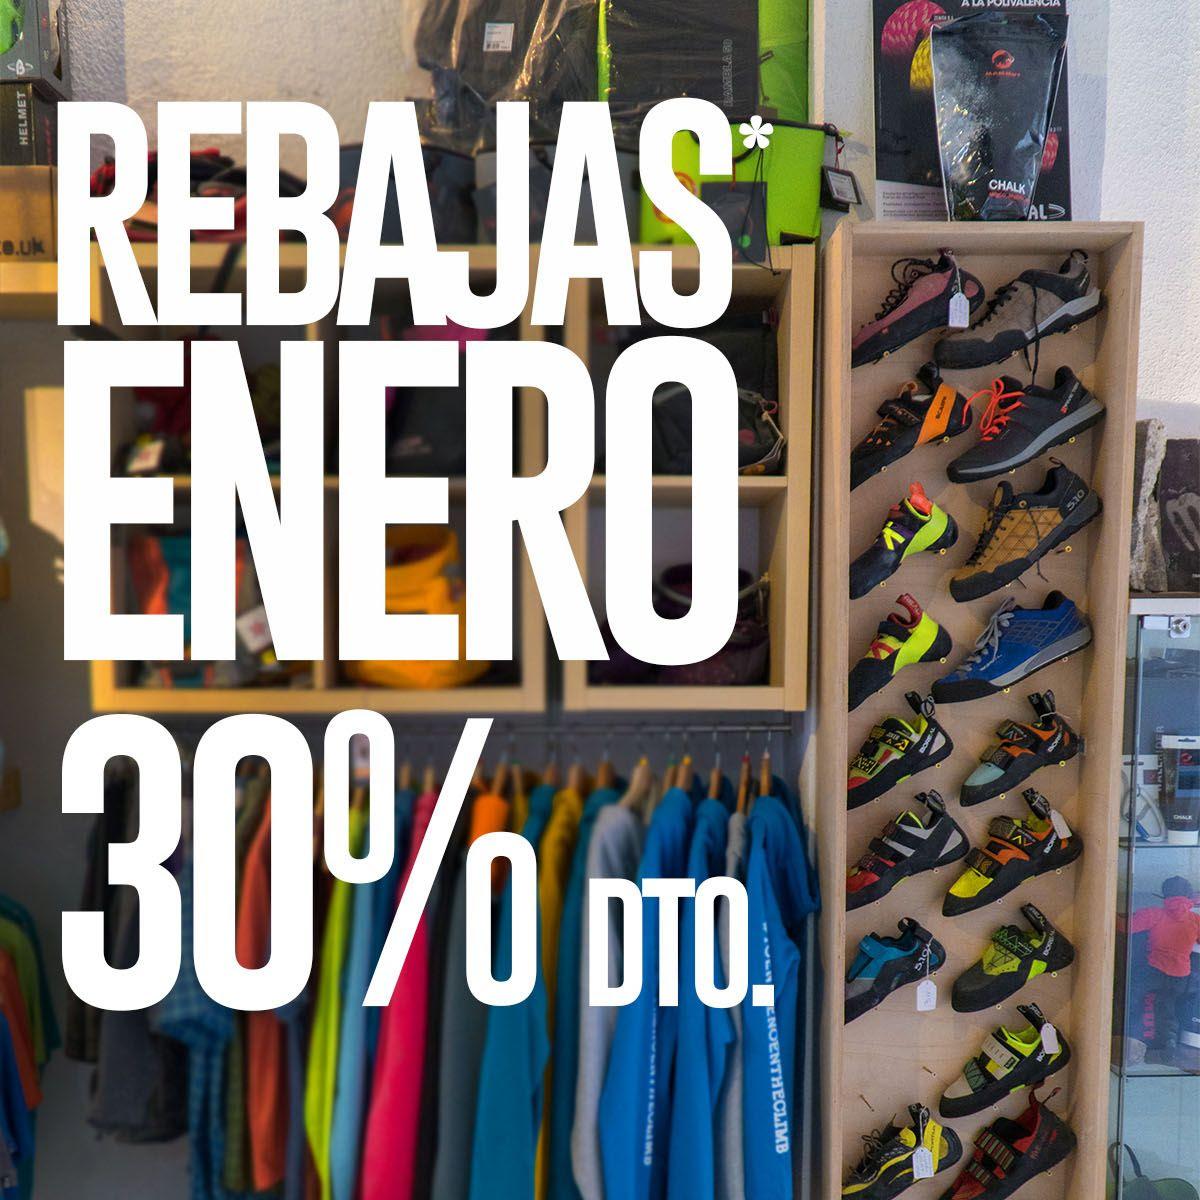 rebajas-2019-theclimb-escalada